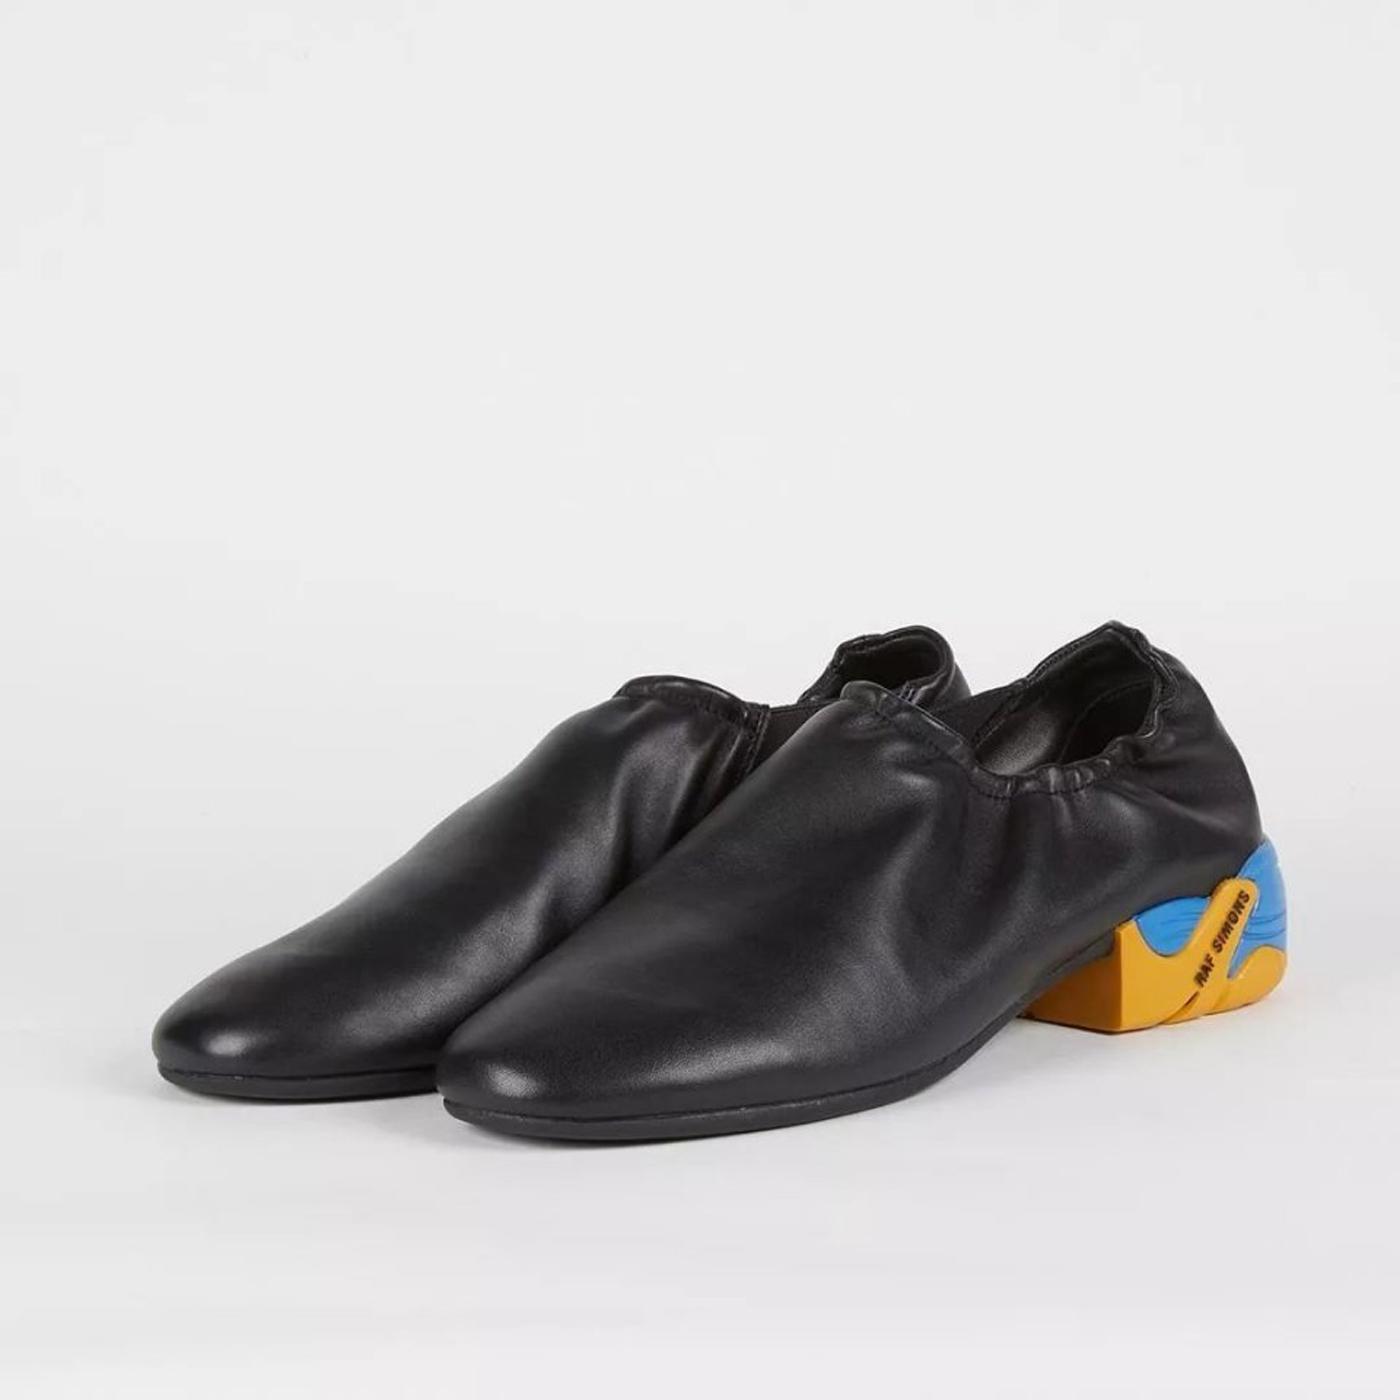 籃球鞋,球鞋趨勢,2020球鞋,2020鞋款,鞋款,球鞋,鞋款趨勢,球鞋趨勢,2020秋冬趨勢,2020秋冬鞋趨勢,2020秋冬鞋款,2020 fw 鞋趨勢,sacai,Nike Pegasus VaporFly SP,Acne Studios,Wales Bonner adidas,Craig Green adidas,GmbH ASICS GEL,gravis plain-me CUDJICK,gravis,Raf Simons (RUNNER),Raf Simons,Maison Margiela Reebok,Matthew M Williams Nike Zoom MMW 4,COMME des GARÇONS Nike Air Force 1 Mid